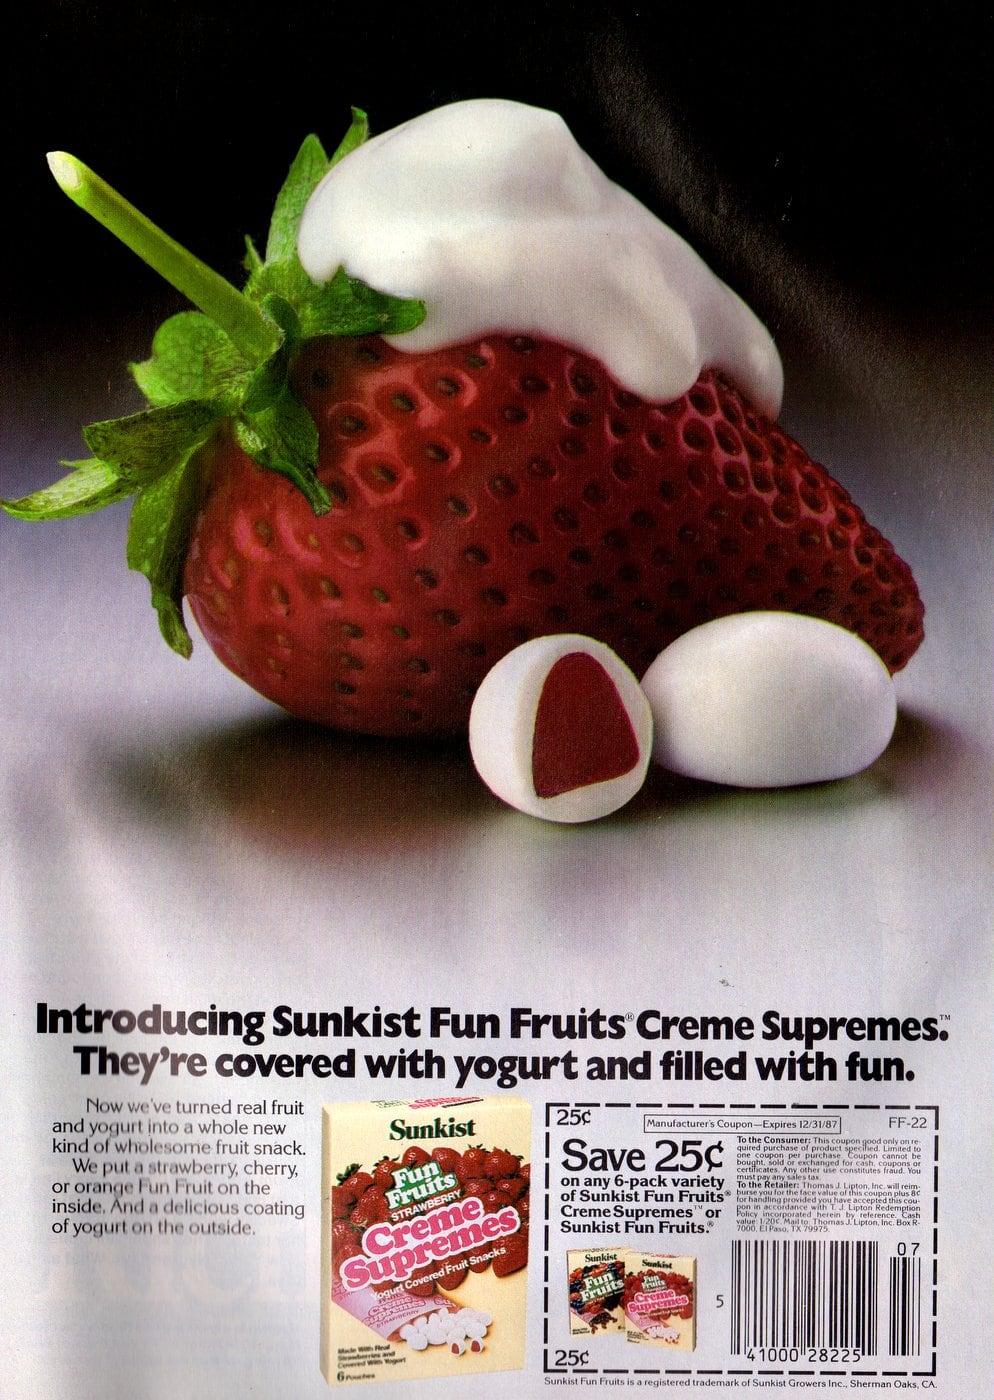 Sunkist Fun Fruits Creme Supremes (1987)